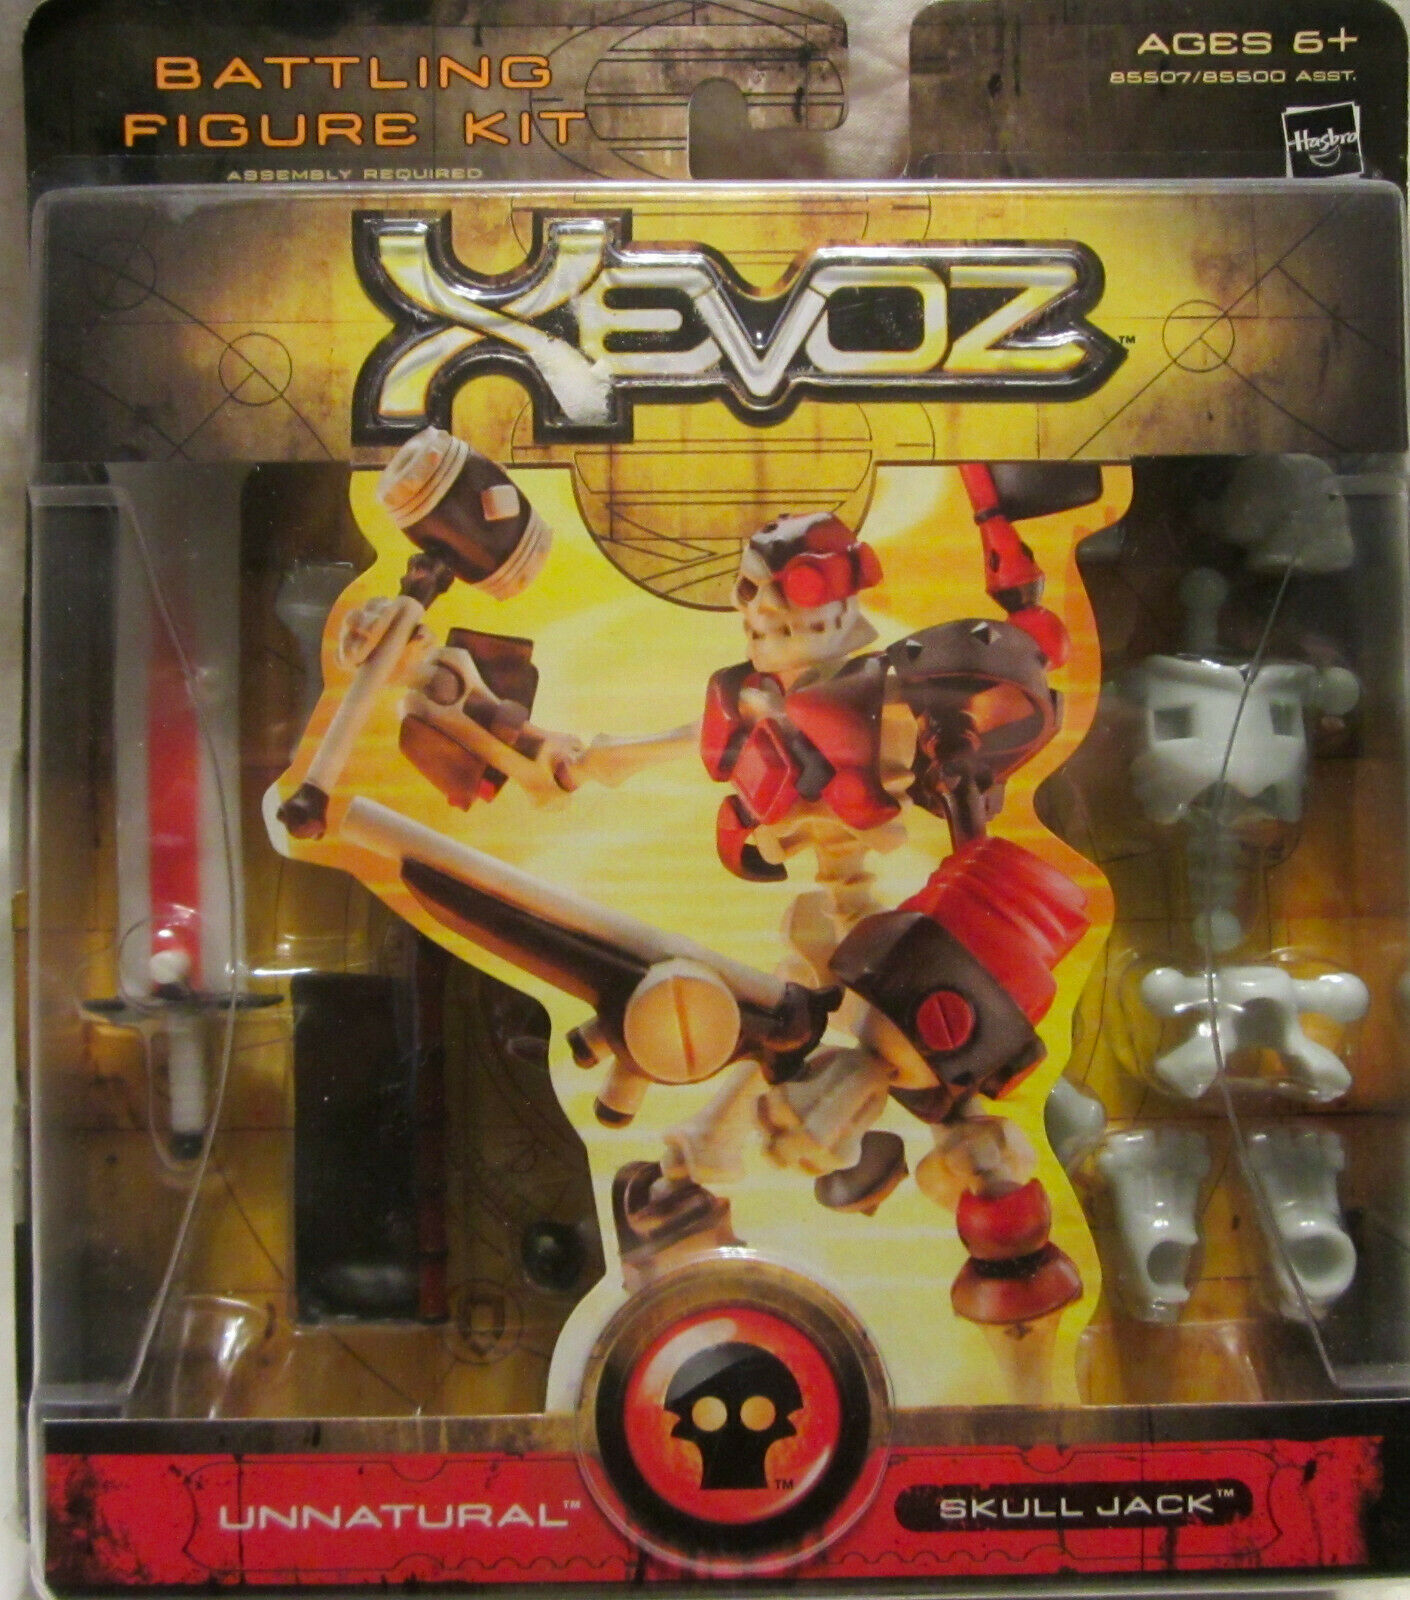 Xevoz Battling cifra Kit Unnatural  Skull Jack Hasbro  nuovo